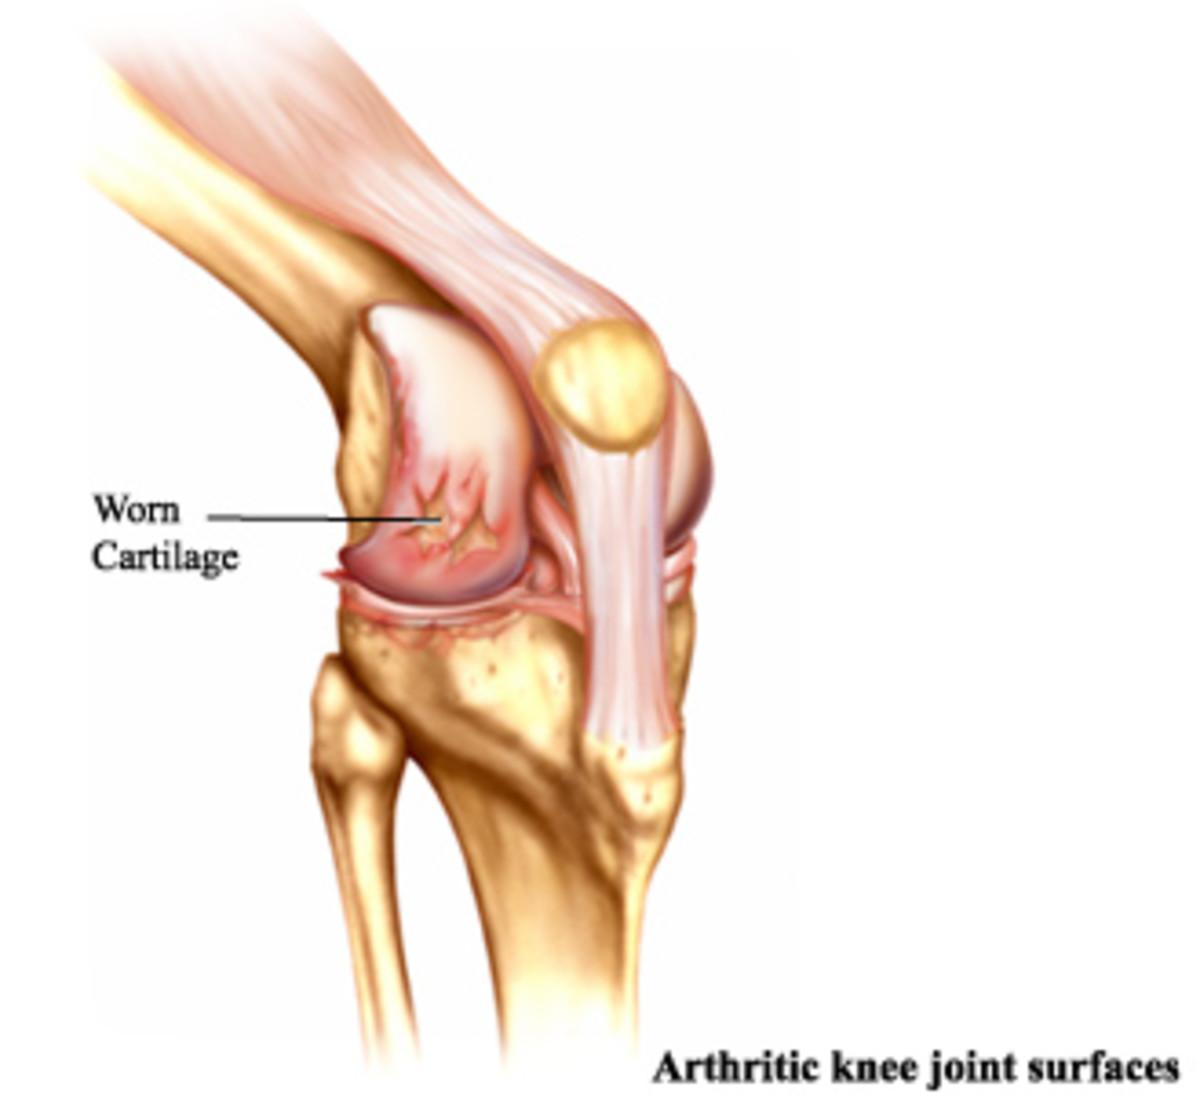 Osteoarthritis or degenerative joint disease is the chronic breakdown of cartilage.